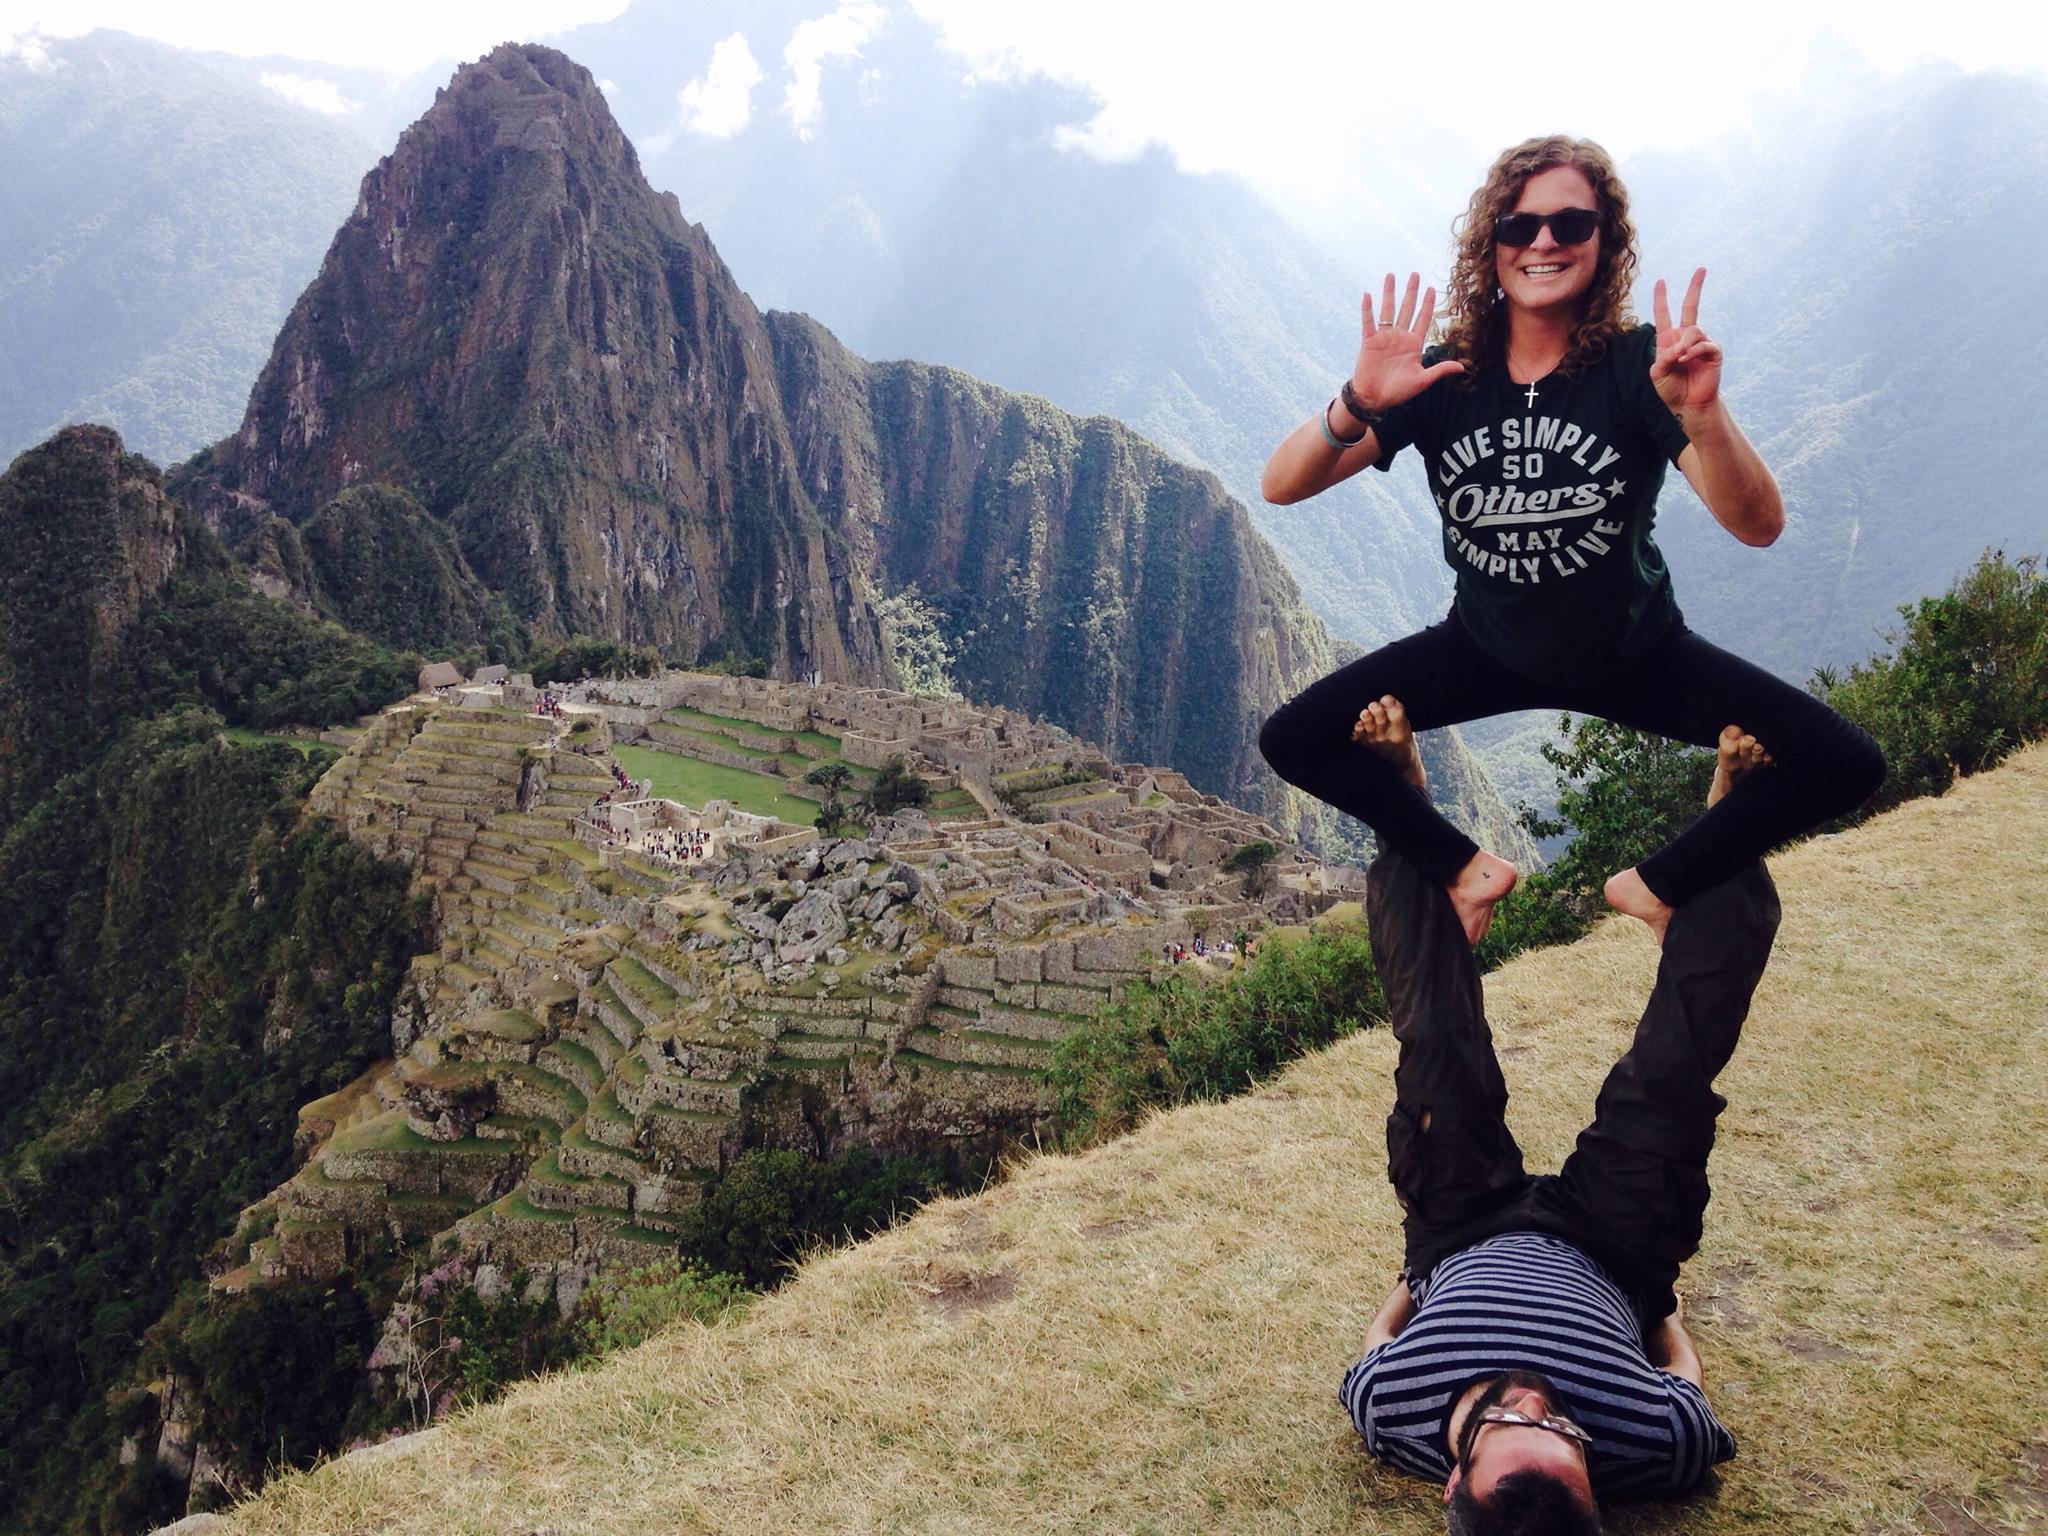 Yoga at the summit.